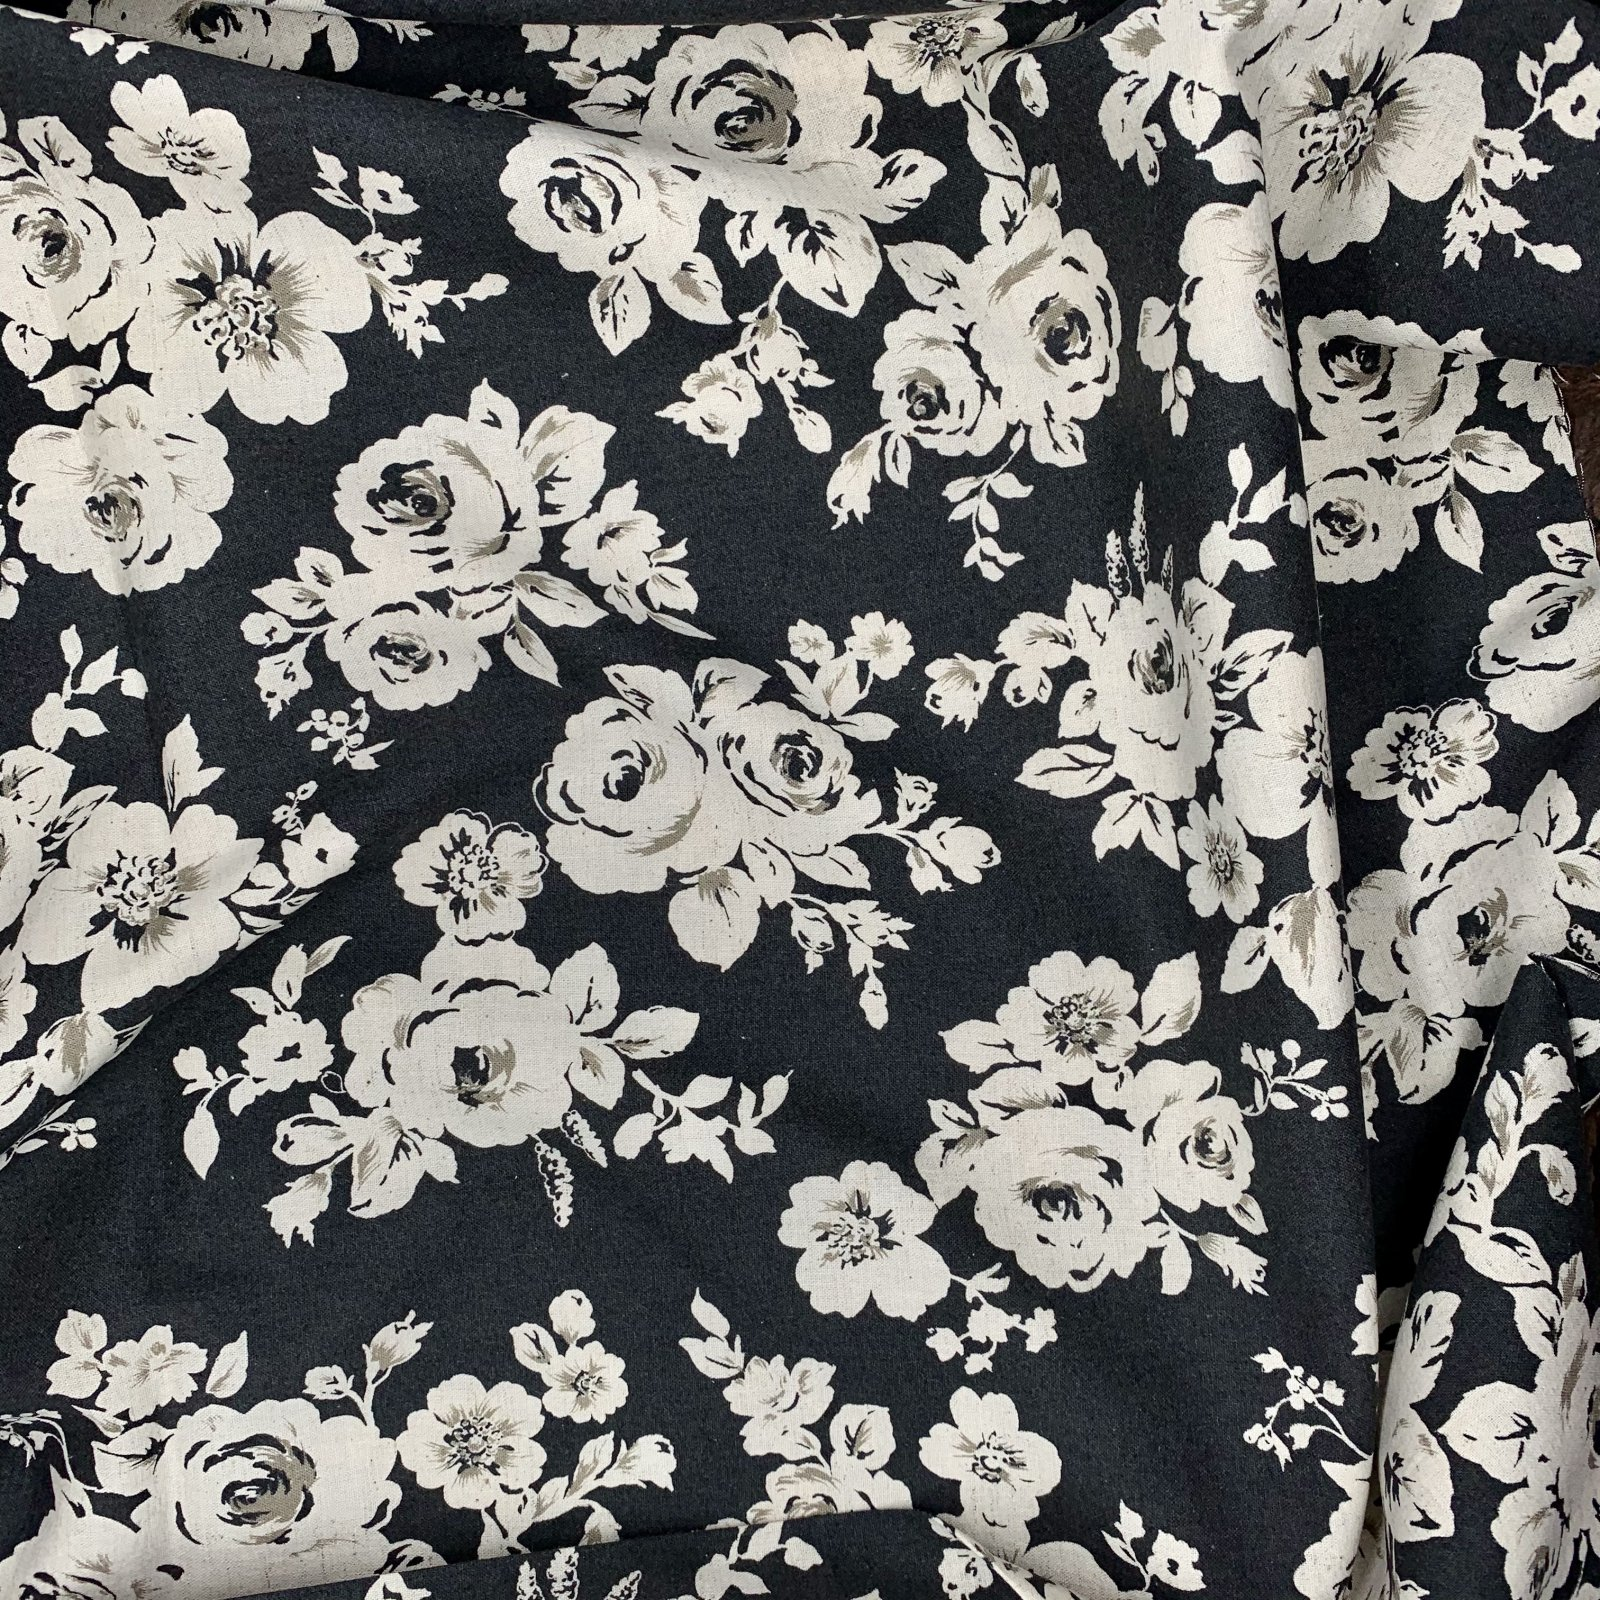 Black - Vintage Roses - Cotton/Linen Sheeting - Kokka